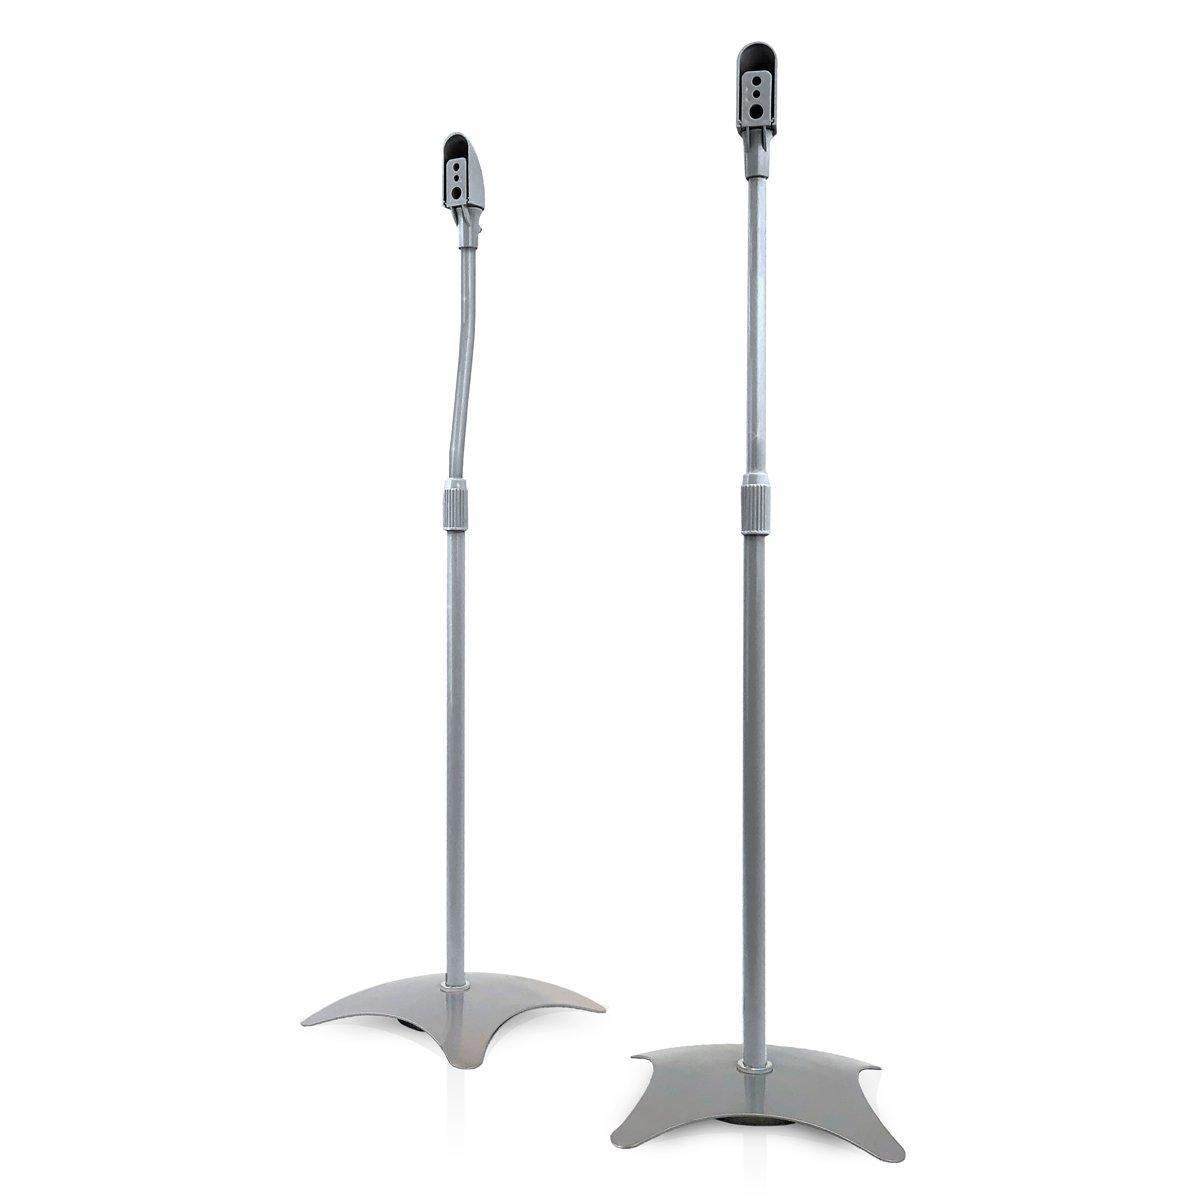 9HORN Pair of Metal Speaker Stands Height Adjustable (Silver, 1 Pair) by 9HORN